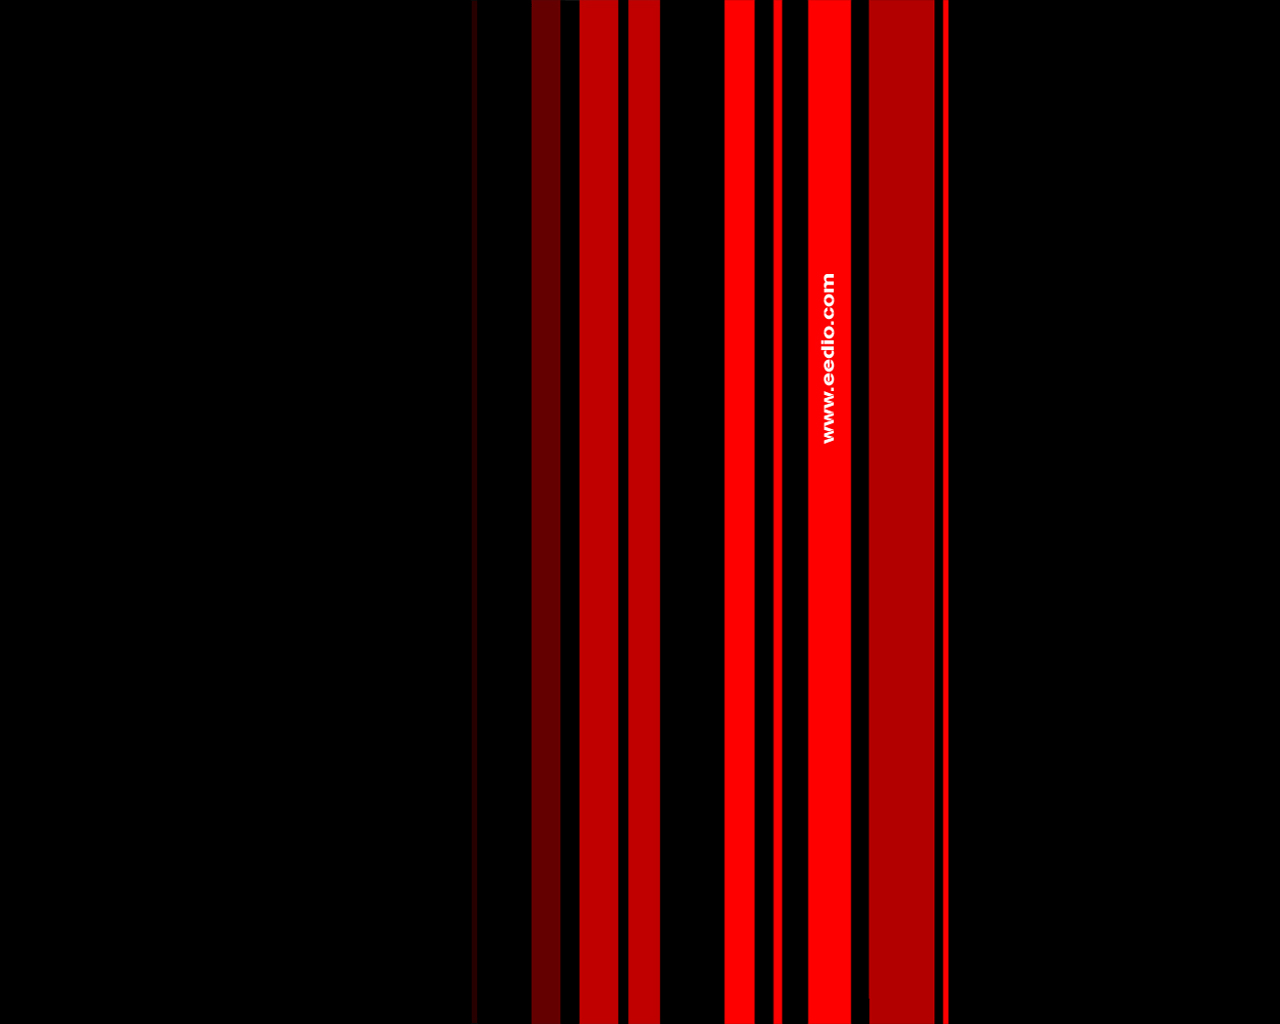 Red And Black Wallpaper Designs 24 Background - Hdblackwallpaper.com